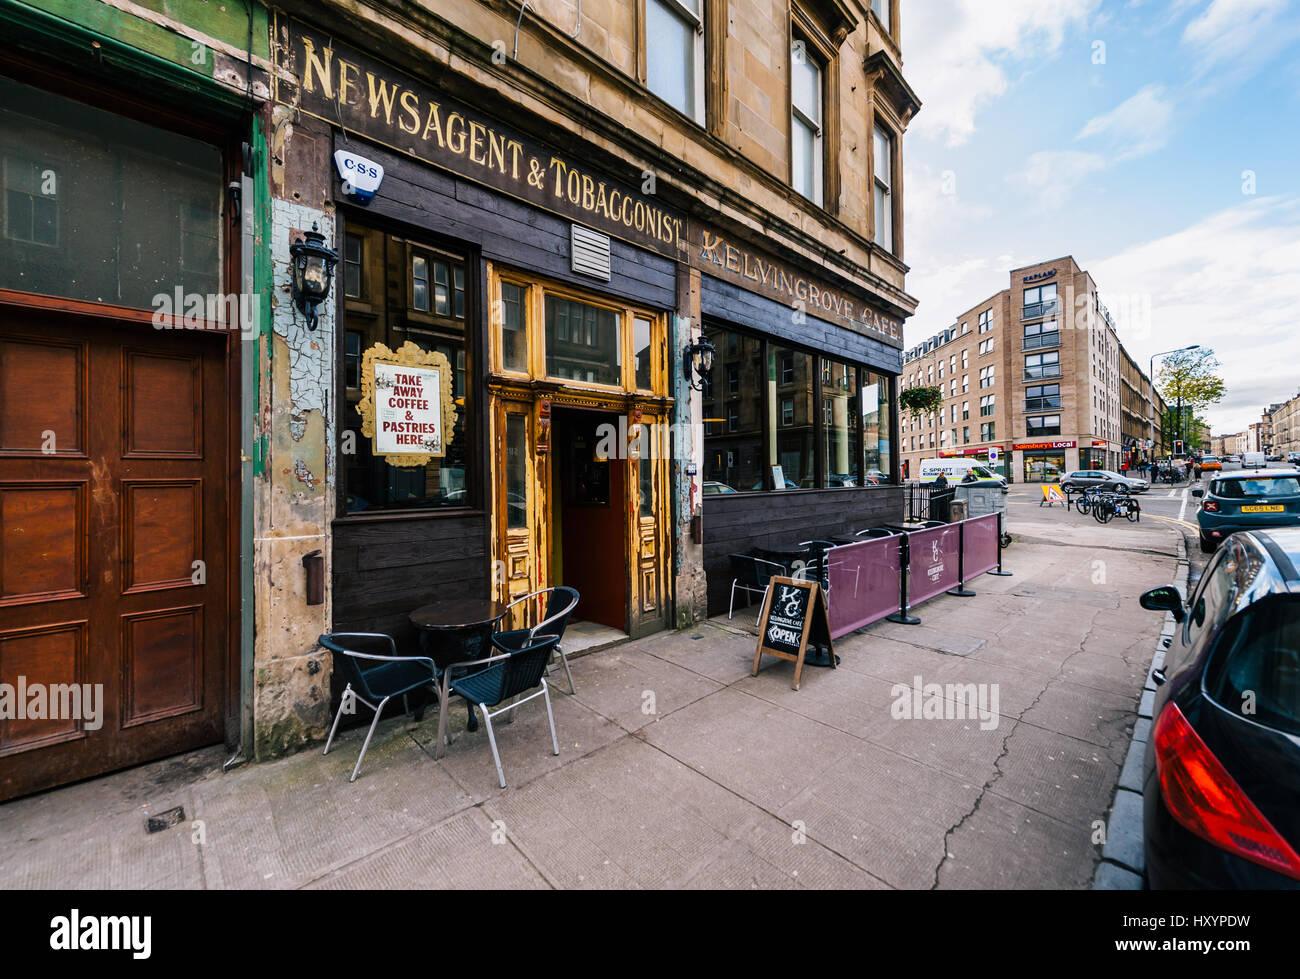 Kelvingrove Cafe on Argyle Street in Glasgow's Finnieston District - Stock Image